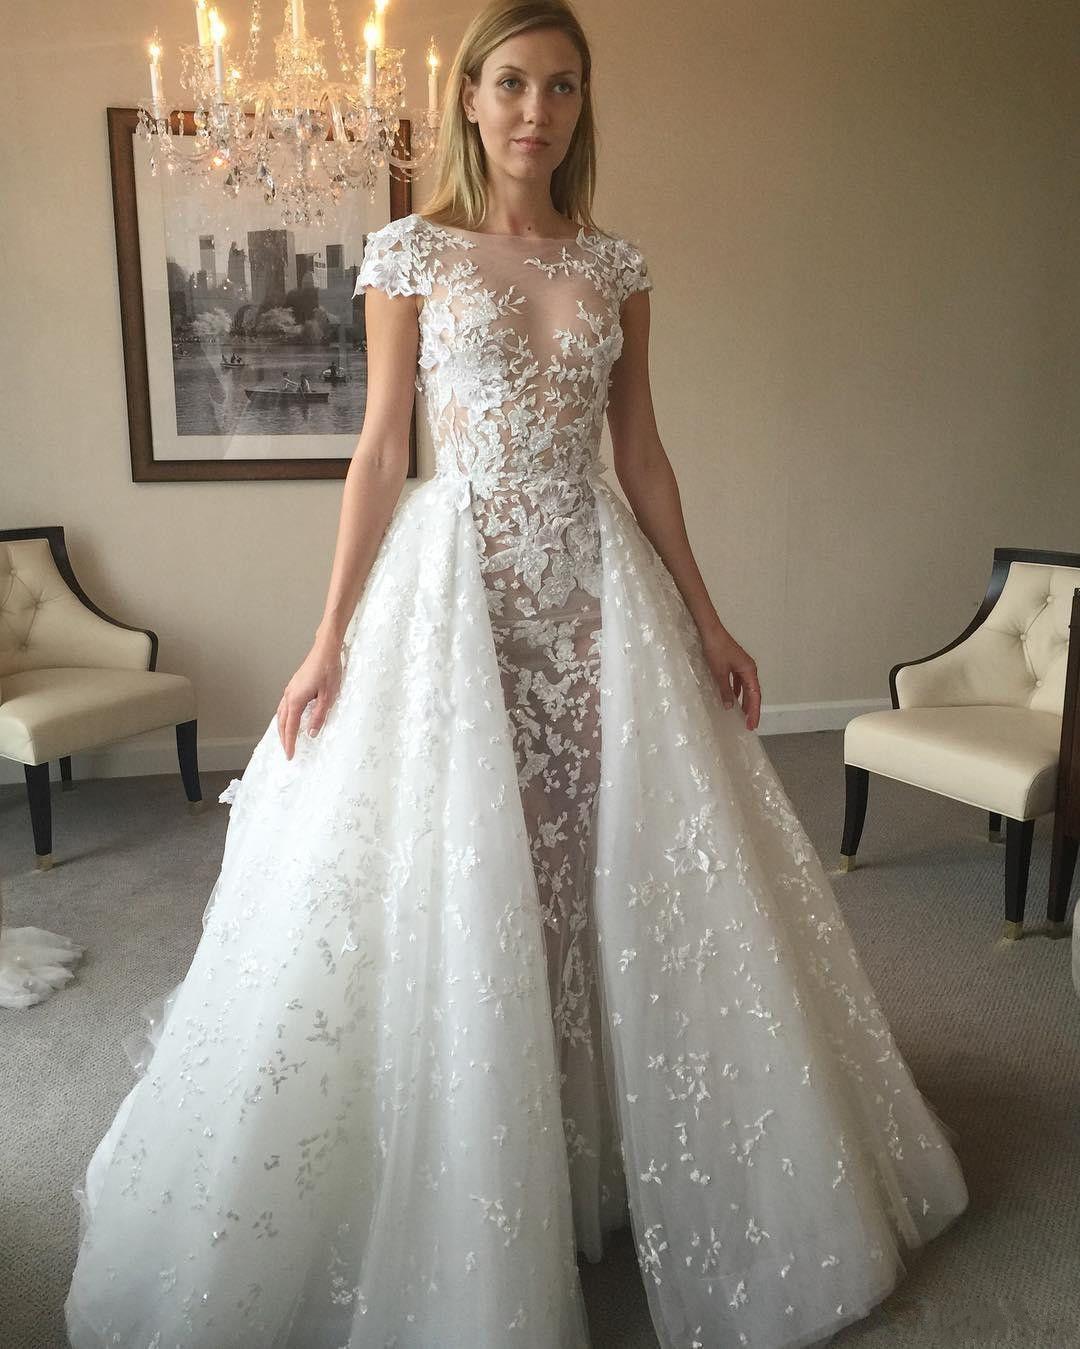 2019 New Zuhair Murad Überrock Brautkleider Kurze Ärmel Sheer Jewel Neck Appliqued Tüll Kapelle A-Line Sweep Zug Perlen Brautkleider